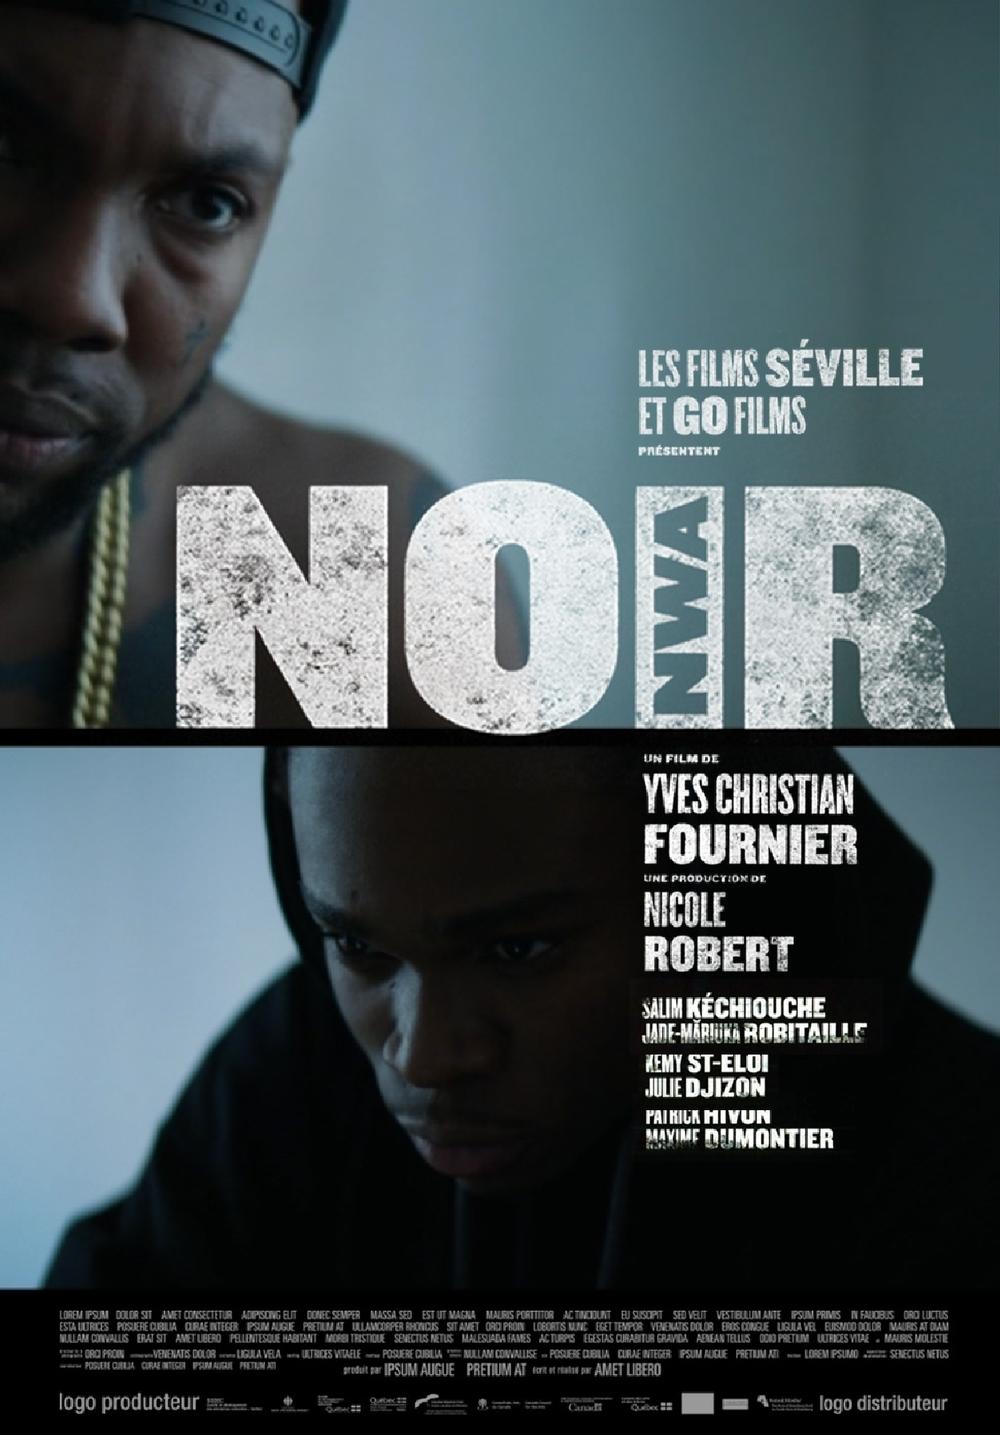 NOIR-Poster-RENZO-13oct-1_00005.jpg